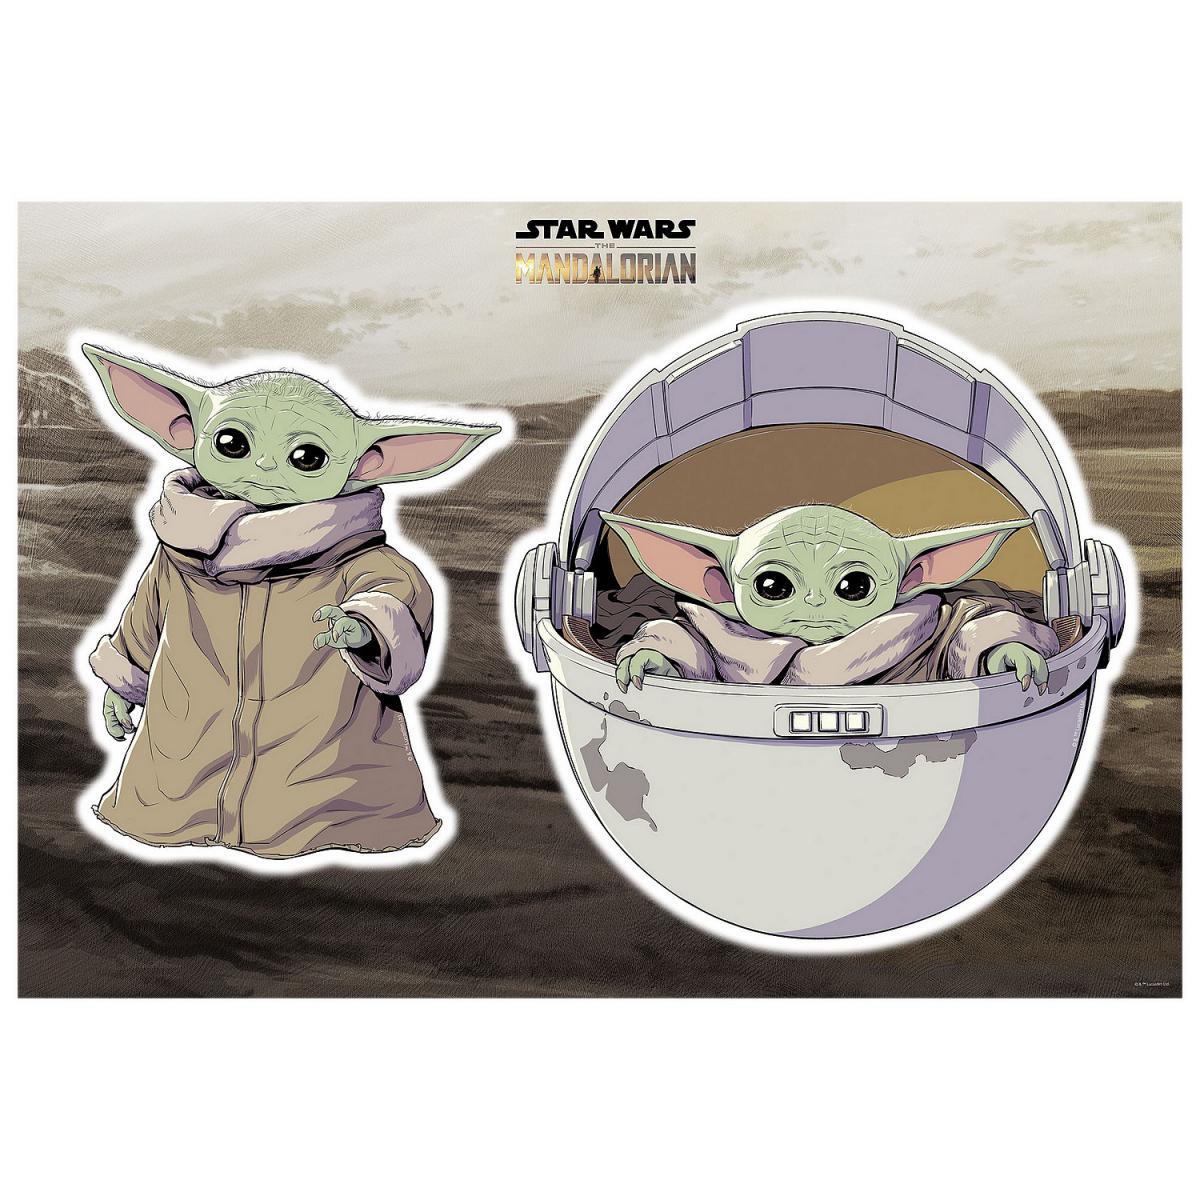 Komar Stickers Muraux géant Mandolorian Baby Yoda The Child Star Wars 50 x 70 cm